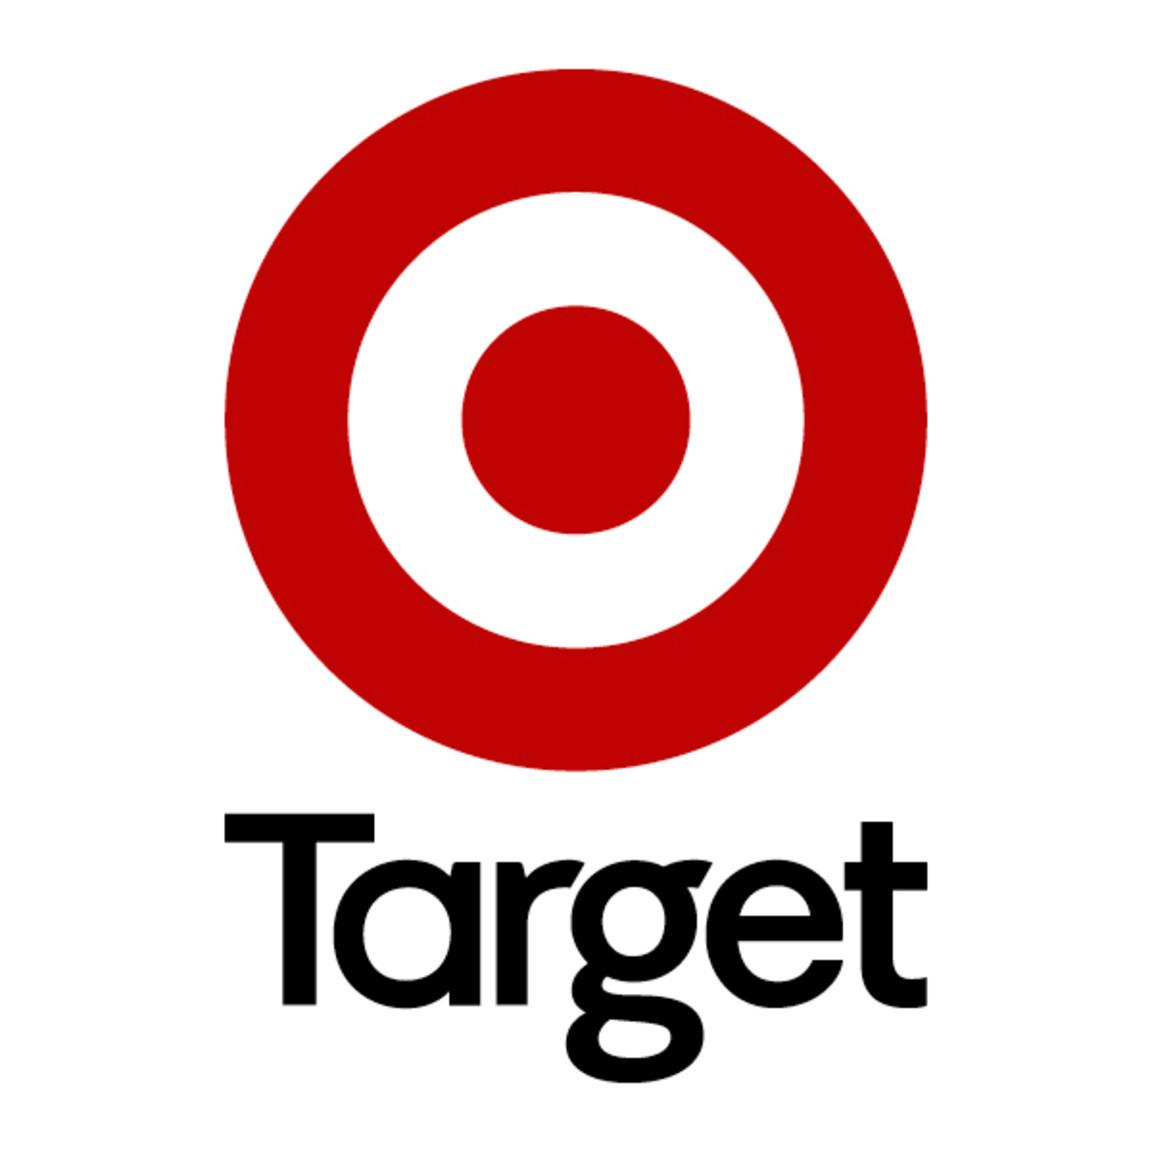 Target At Westfield Parramatta